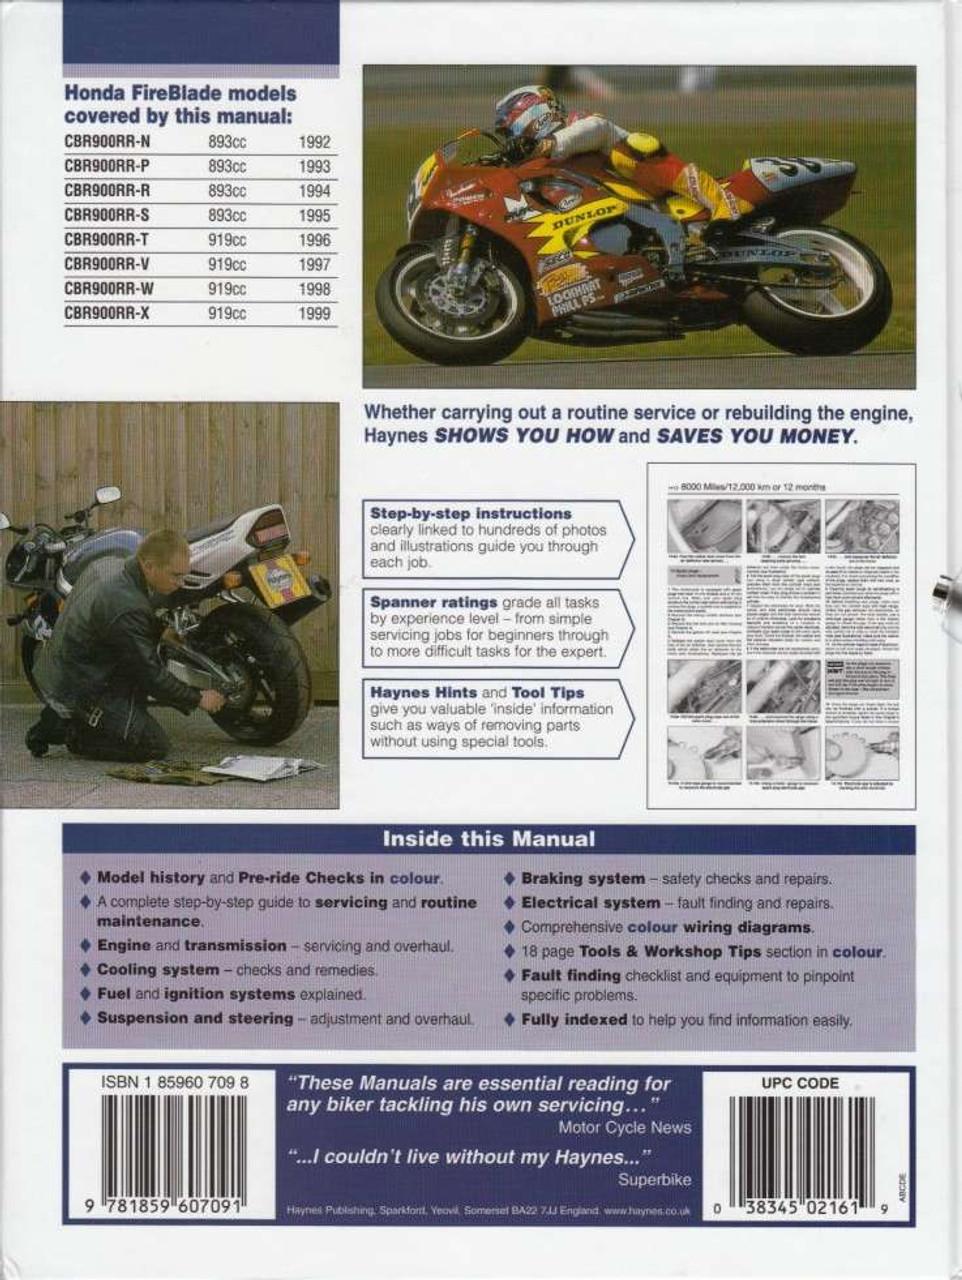 hight resolution of  diagram of honda motorcycle parts 1999 cbr900rr a radiator diagram on honda lower unit diagram